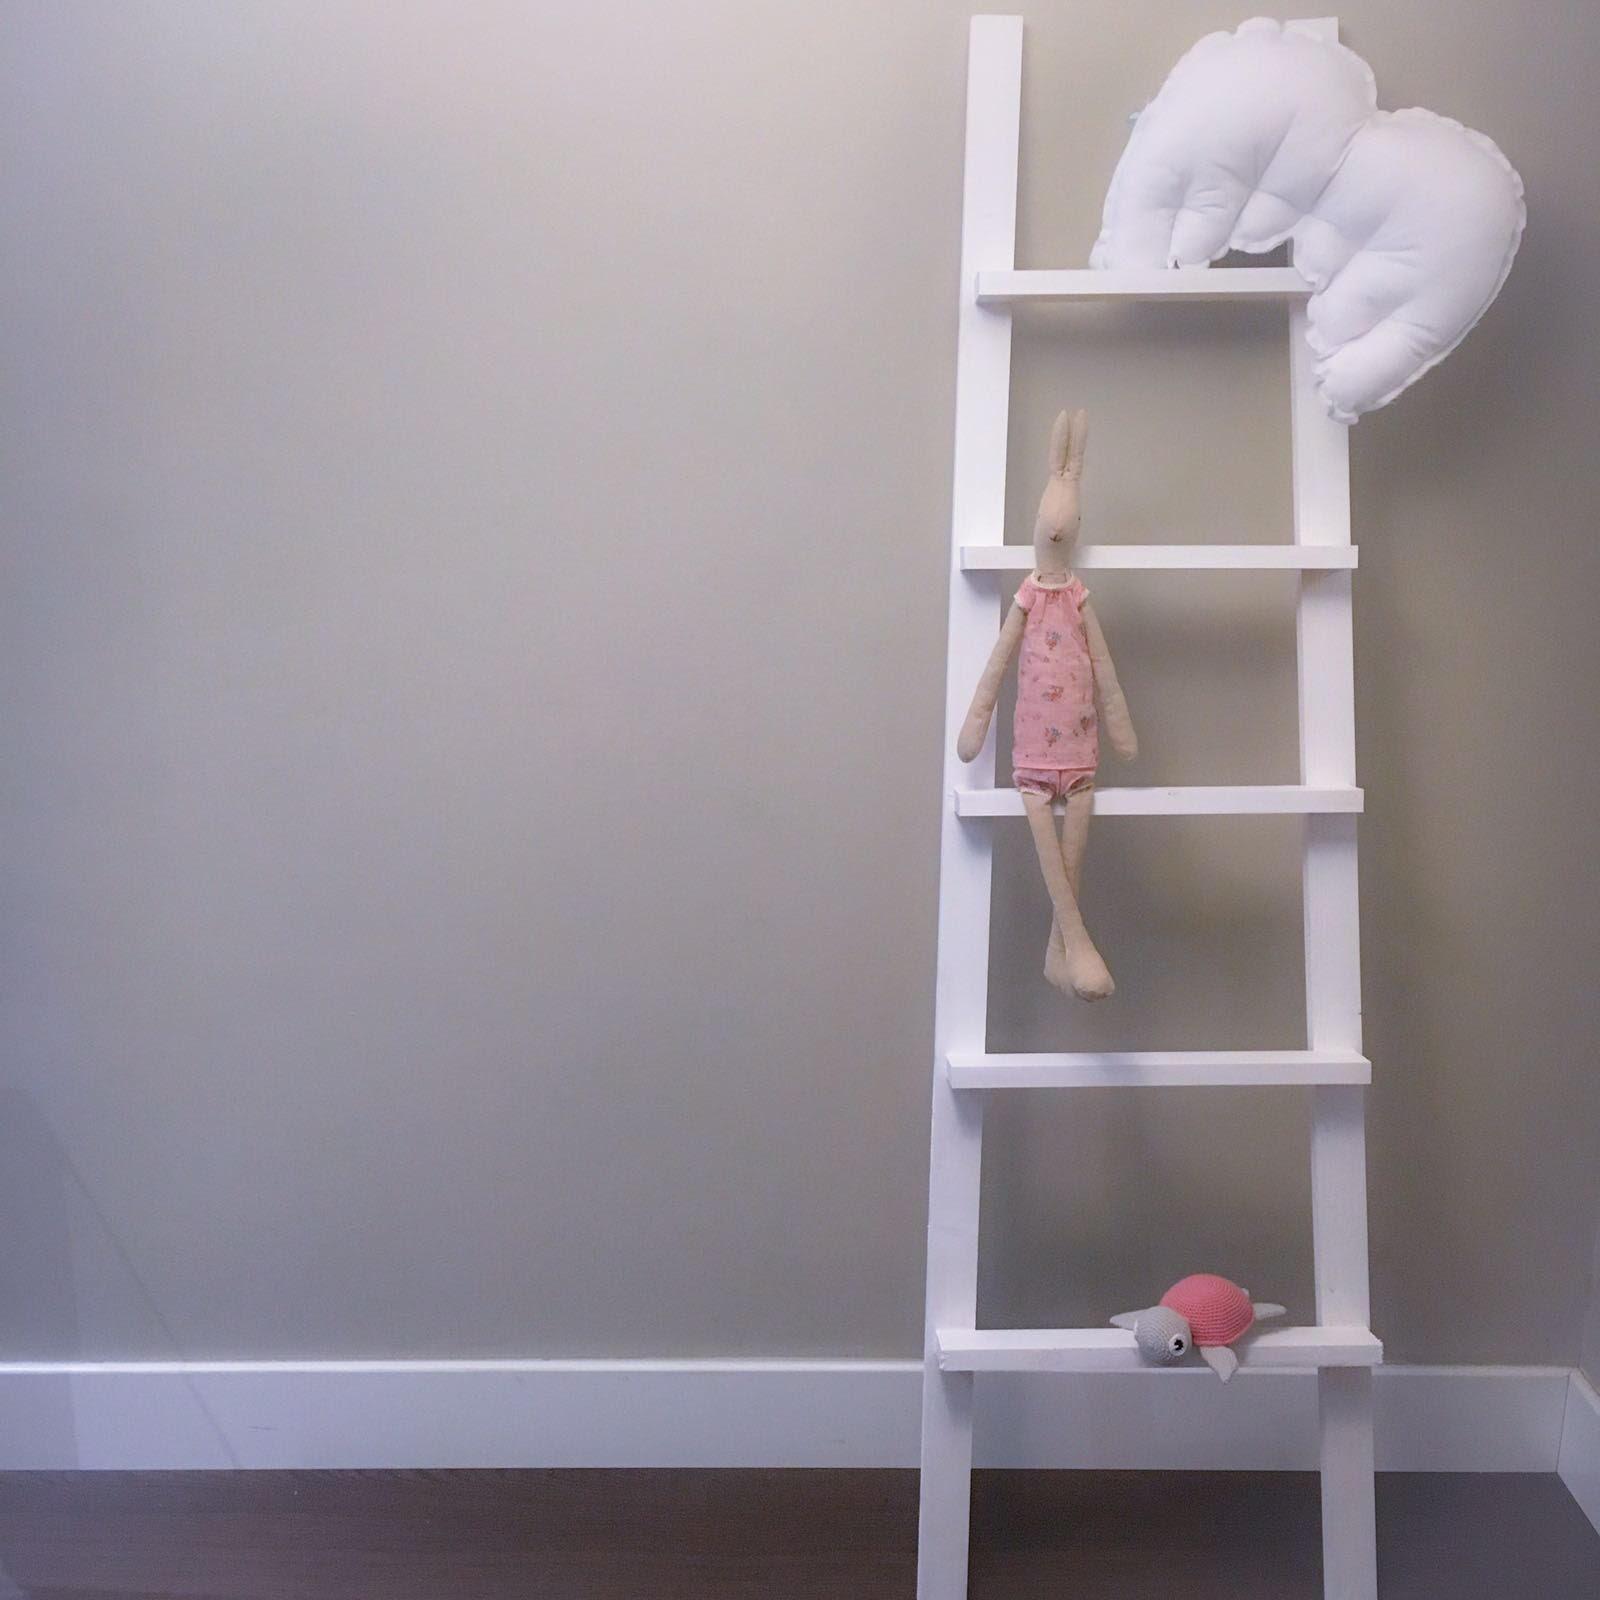 Escalera decorativa 5 pelda os blanca baby kids deco Escalera decorativa blanca